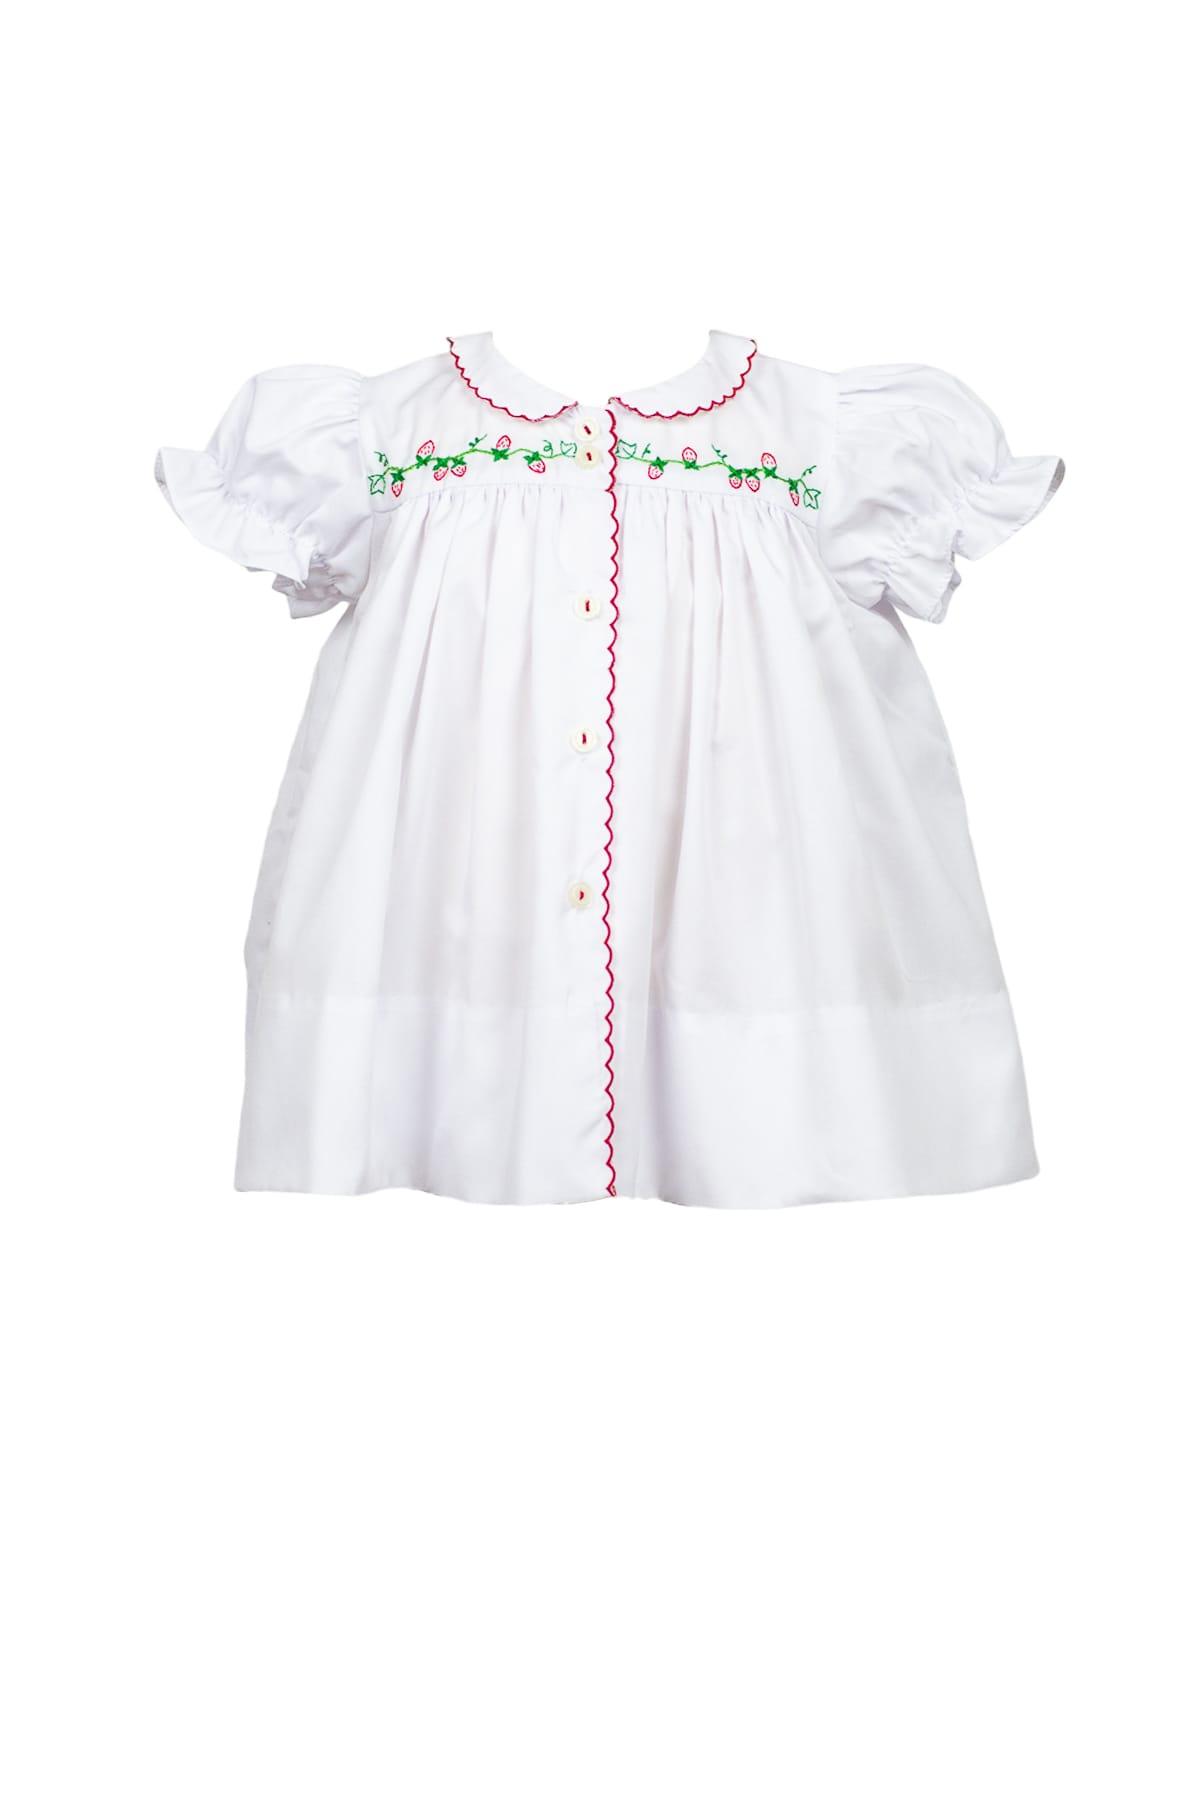 SALLIE STRAWBERRY DRESS